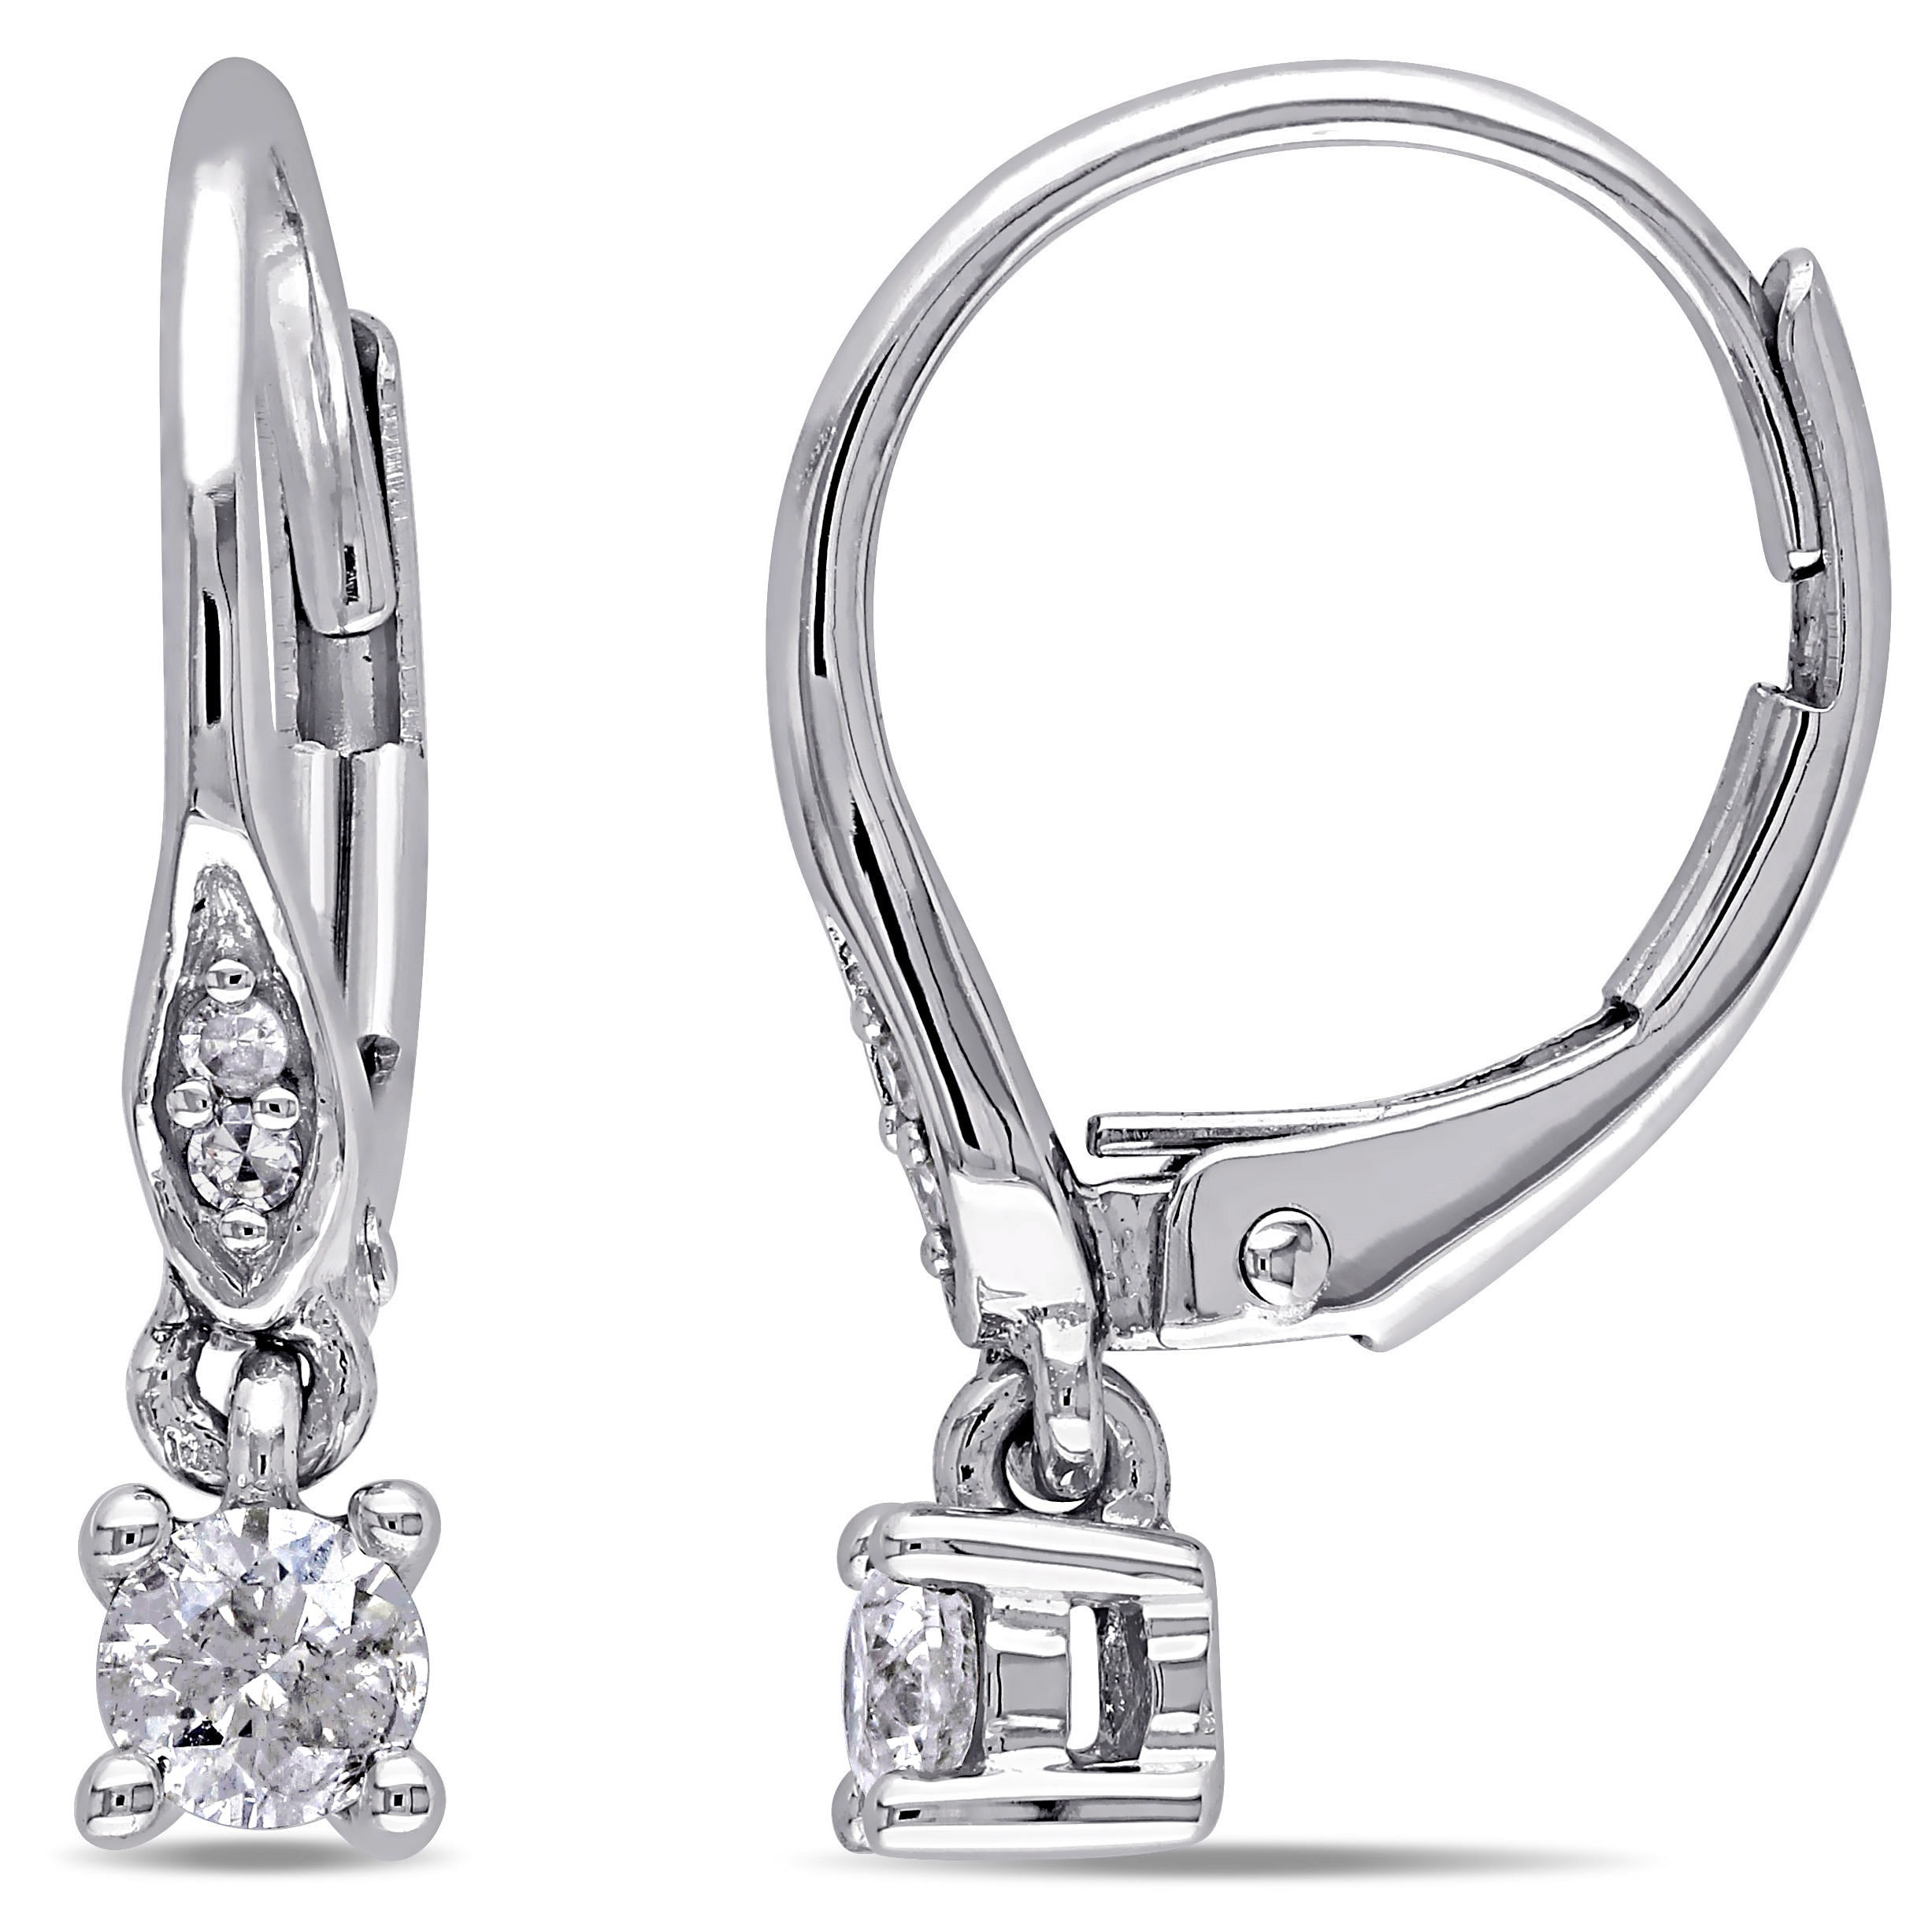 cf2b2b3ed9ed2 Details about Miadora 10k White Gold 1/4ct TDW Diamond Leverback Earrings  Small